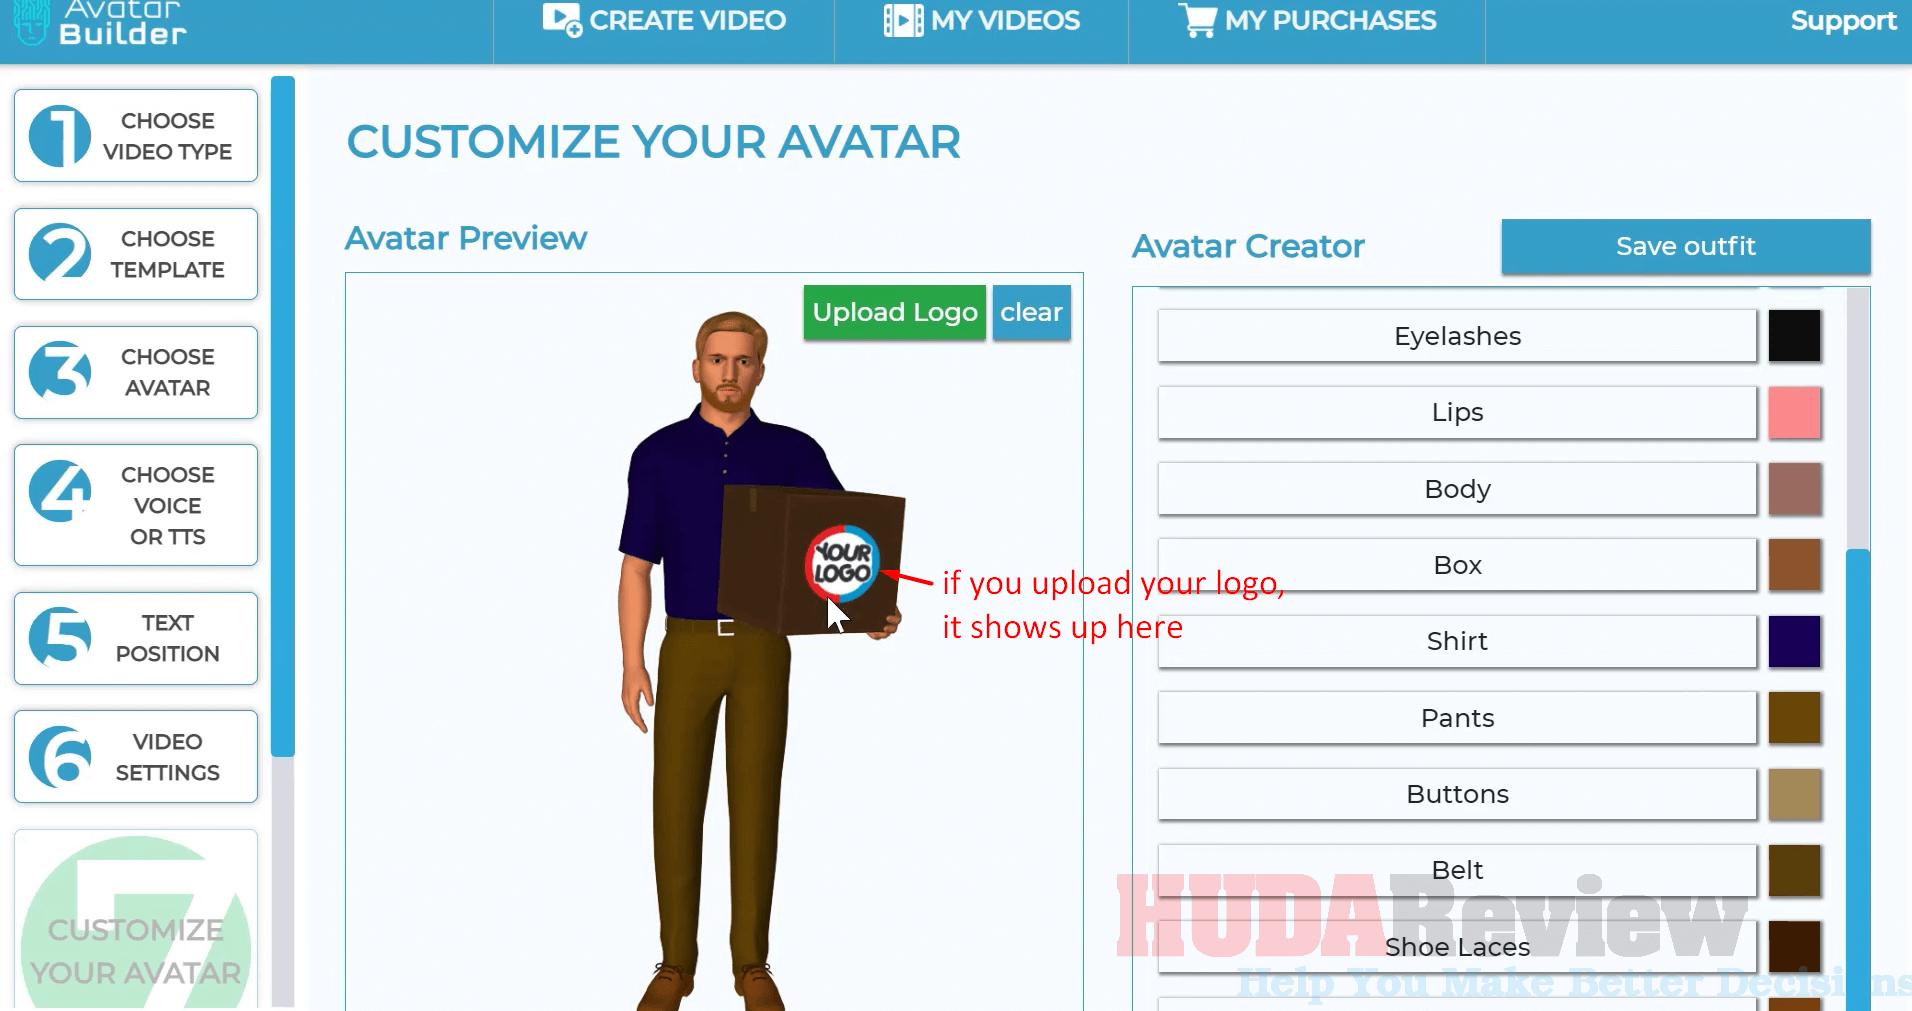 AvatarBuilder-Review-Step-7-4